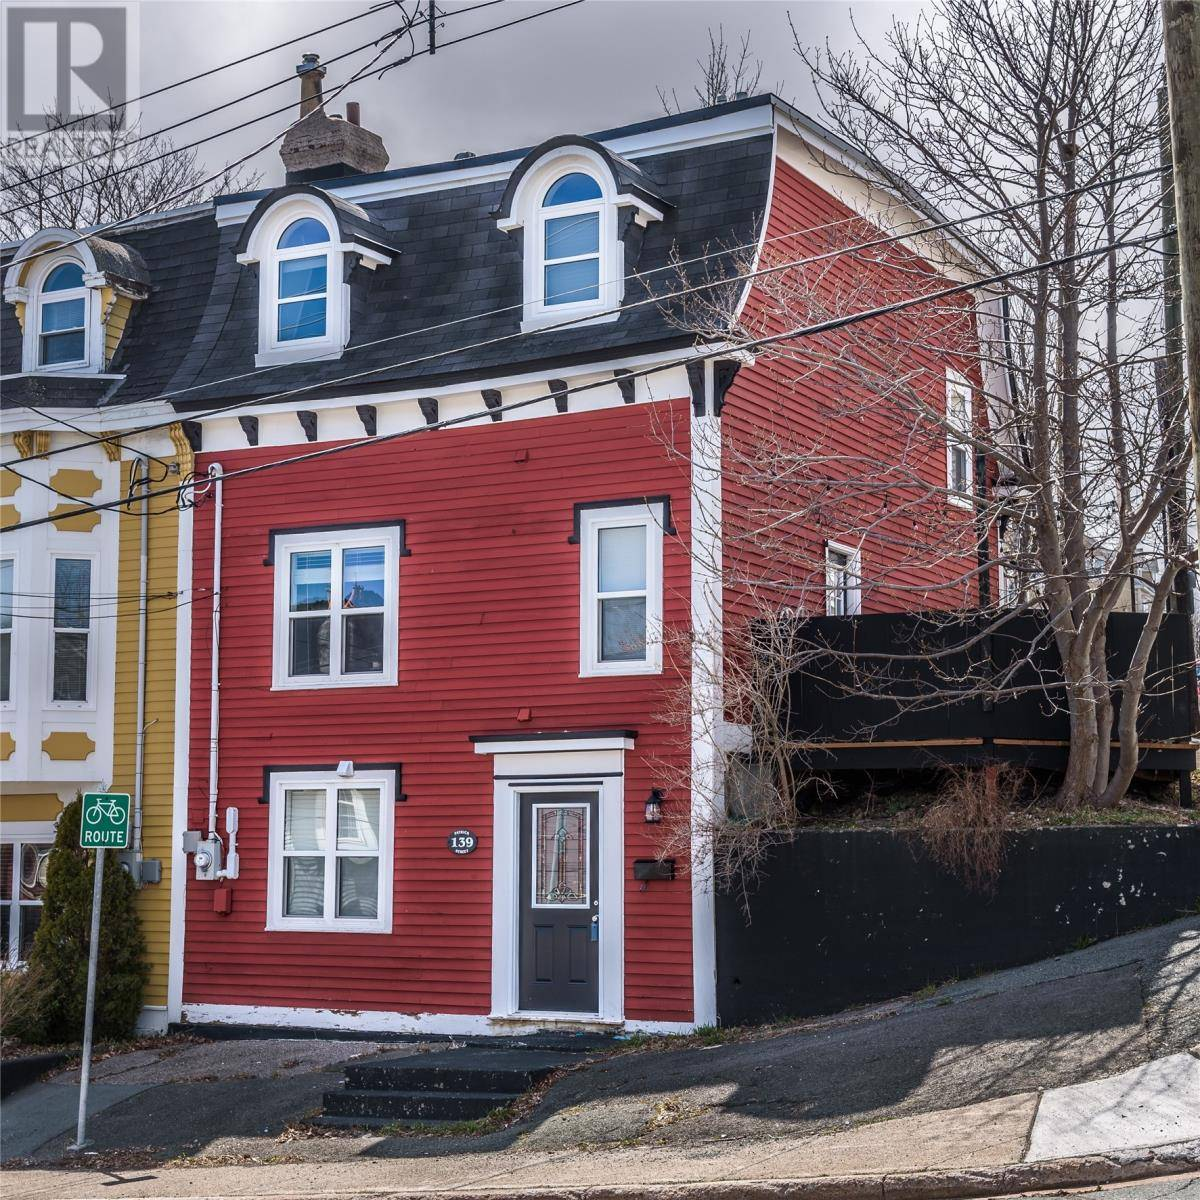 House for sale at 139 Patrick St St. John's Newfoundland - MLS: 1212363